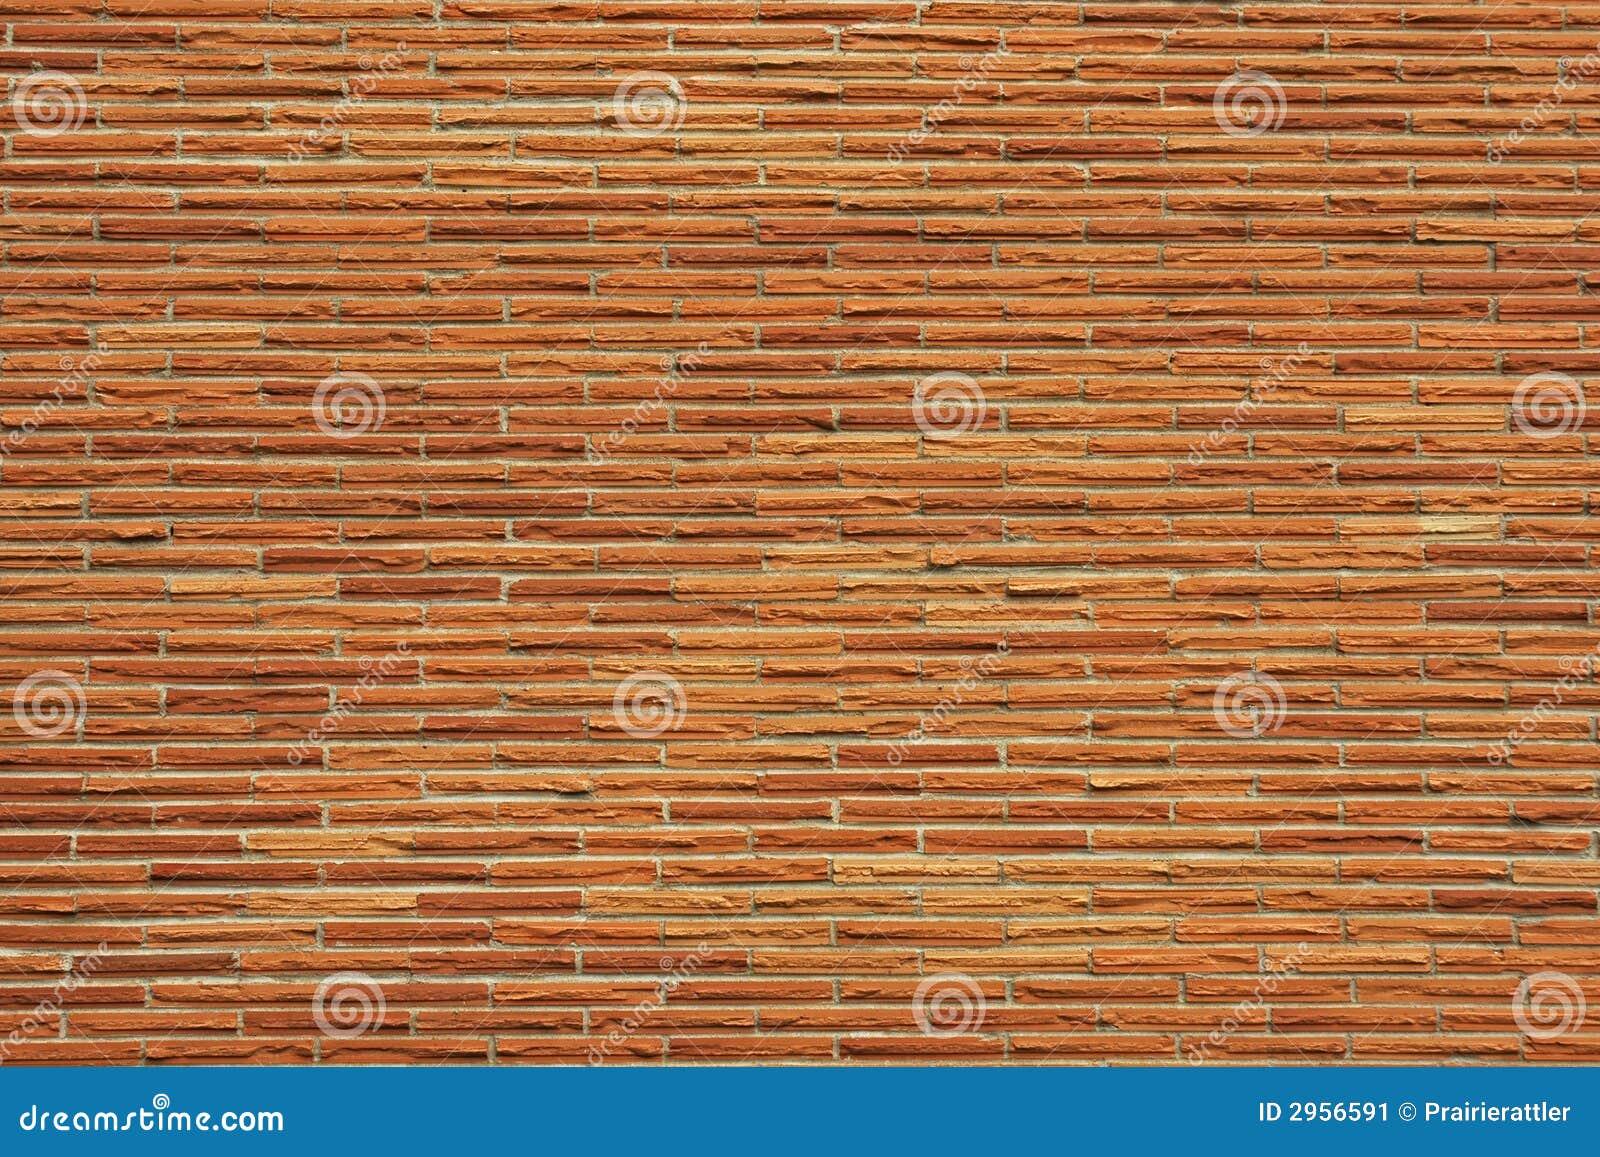 Reddish Thin Brick Wall Stock Image Image Of Nature Masonry 2956591